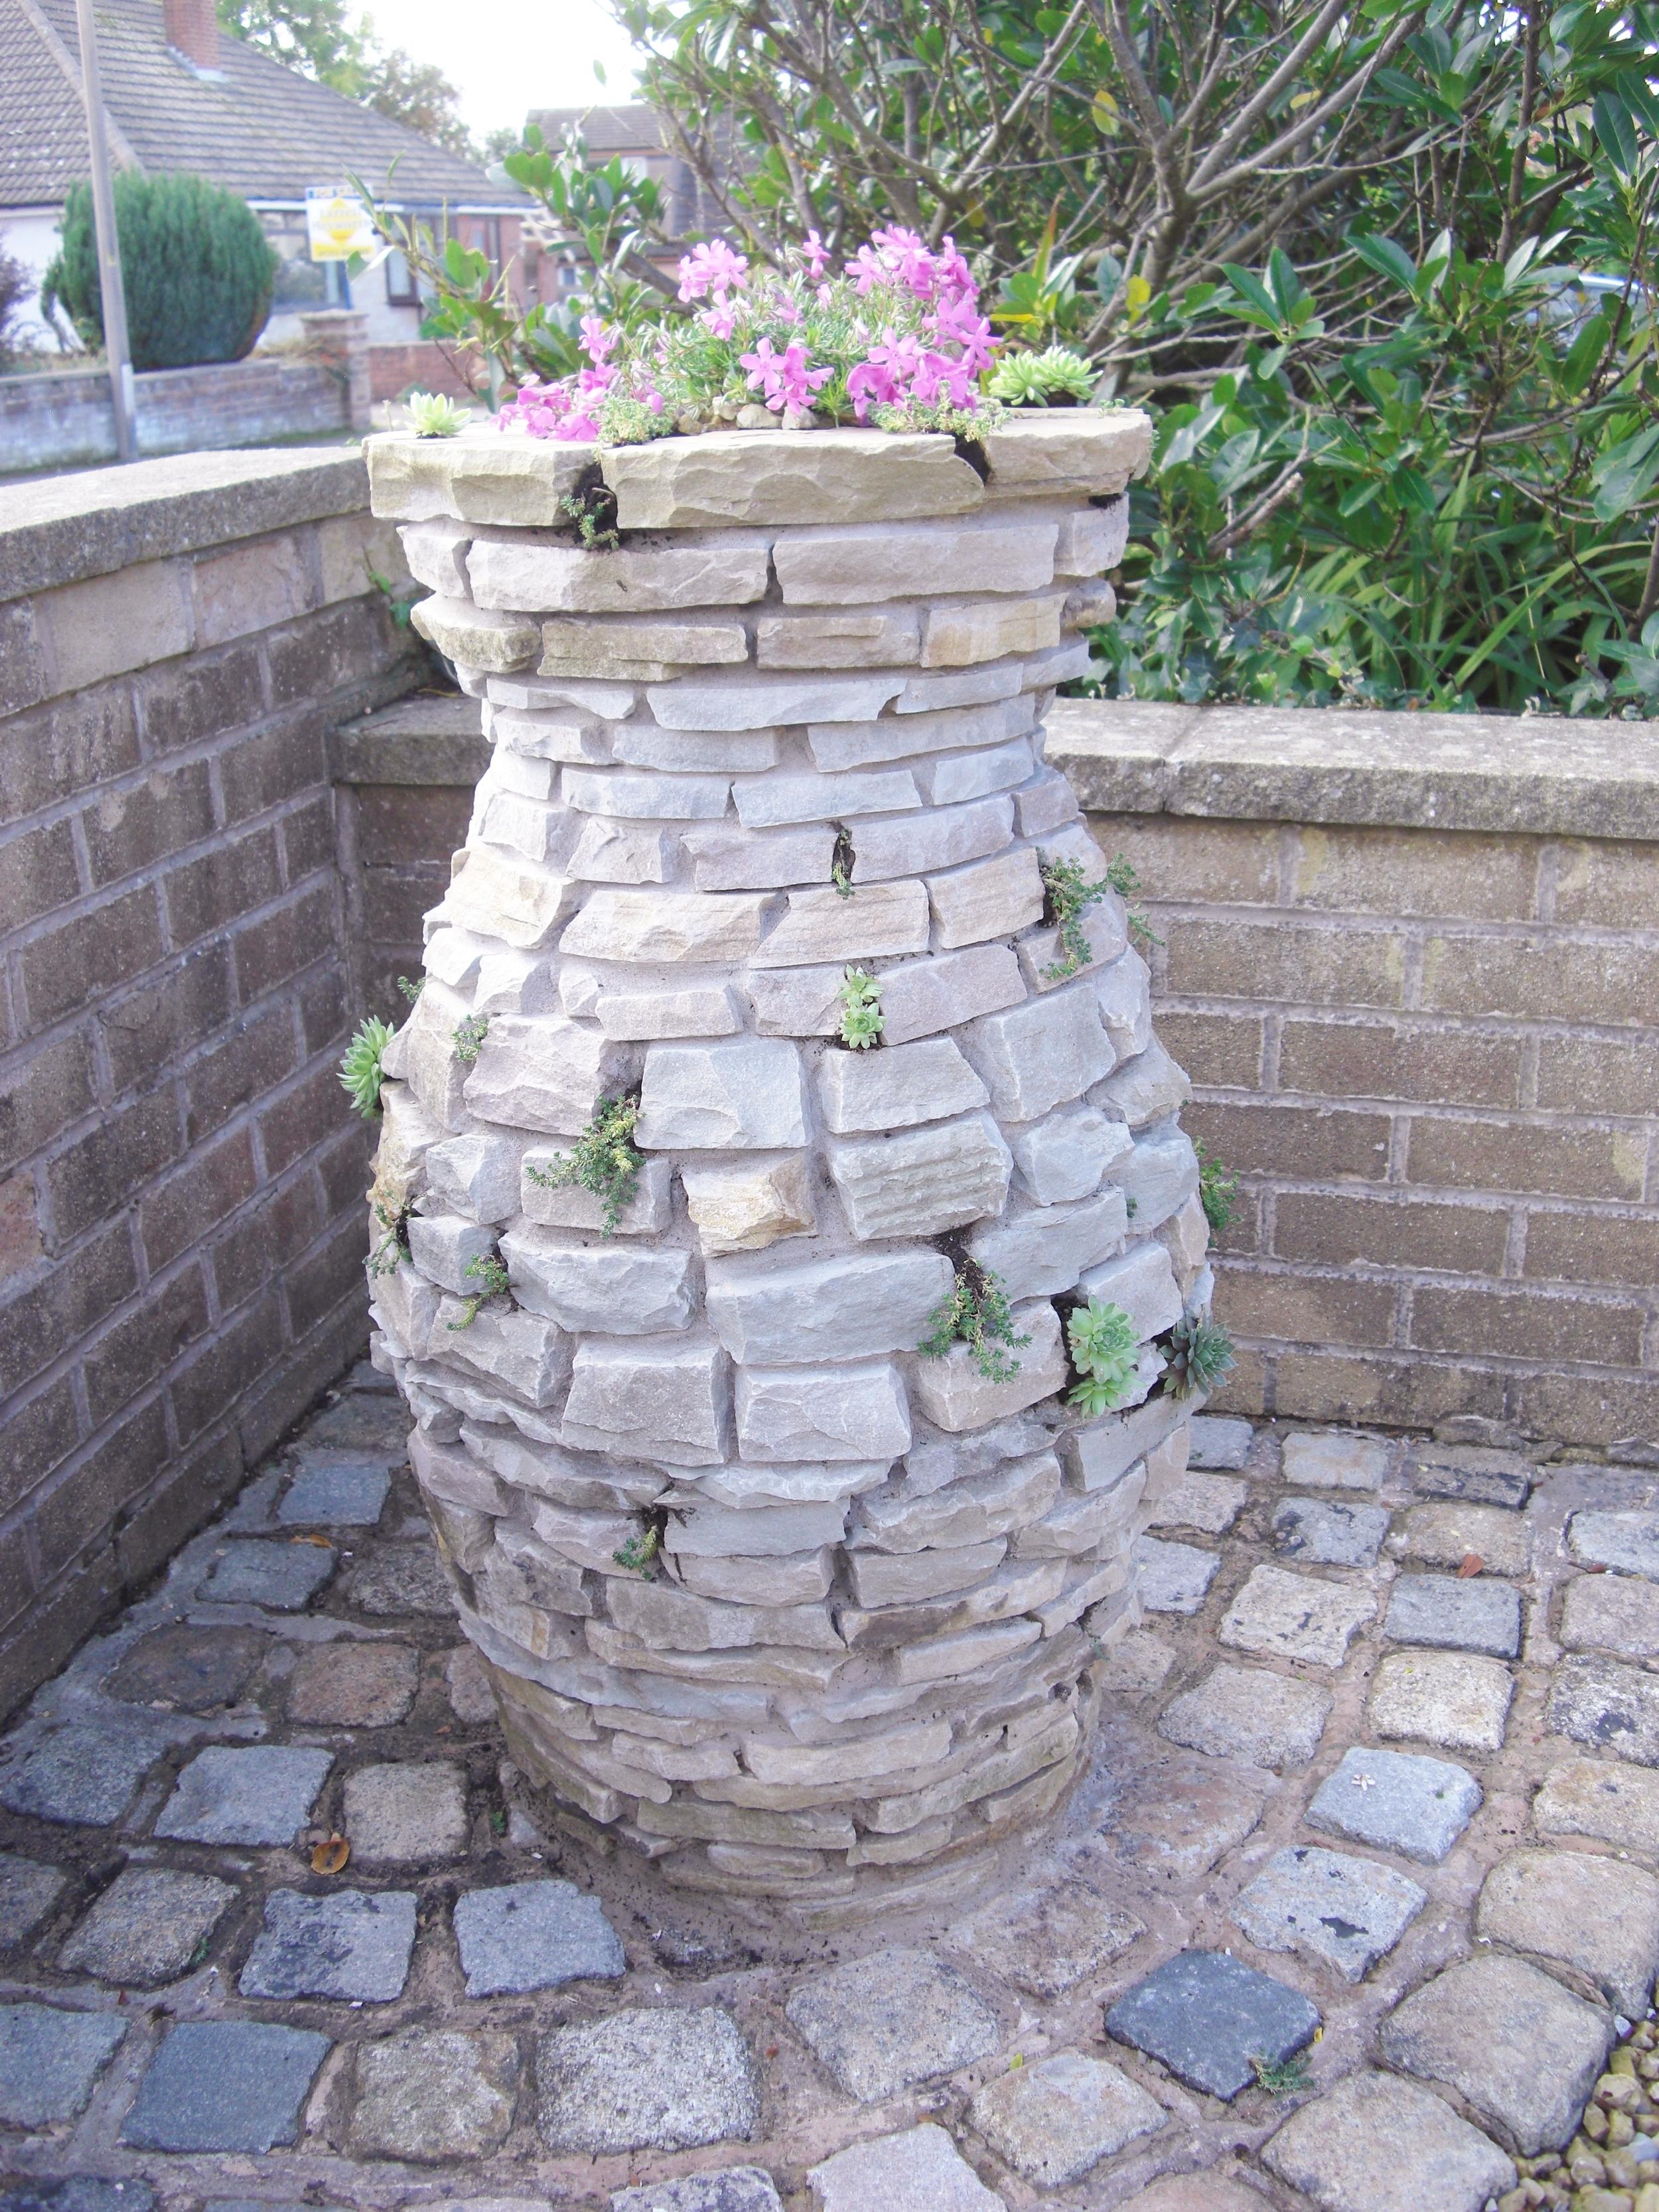 Custom-made stone urn